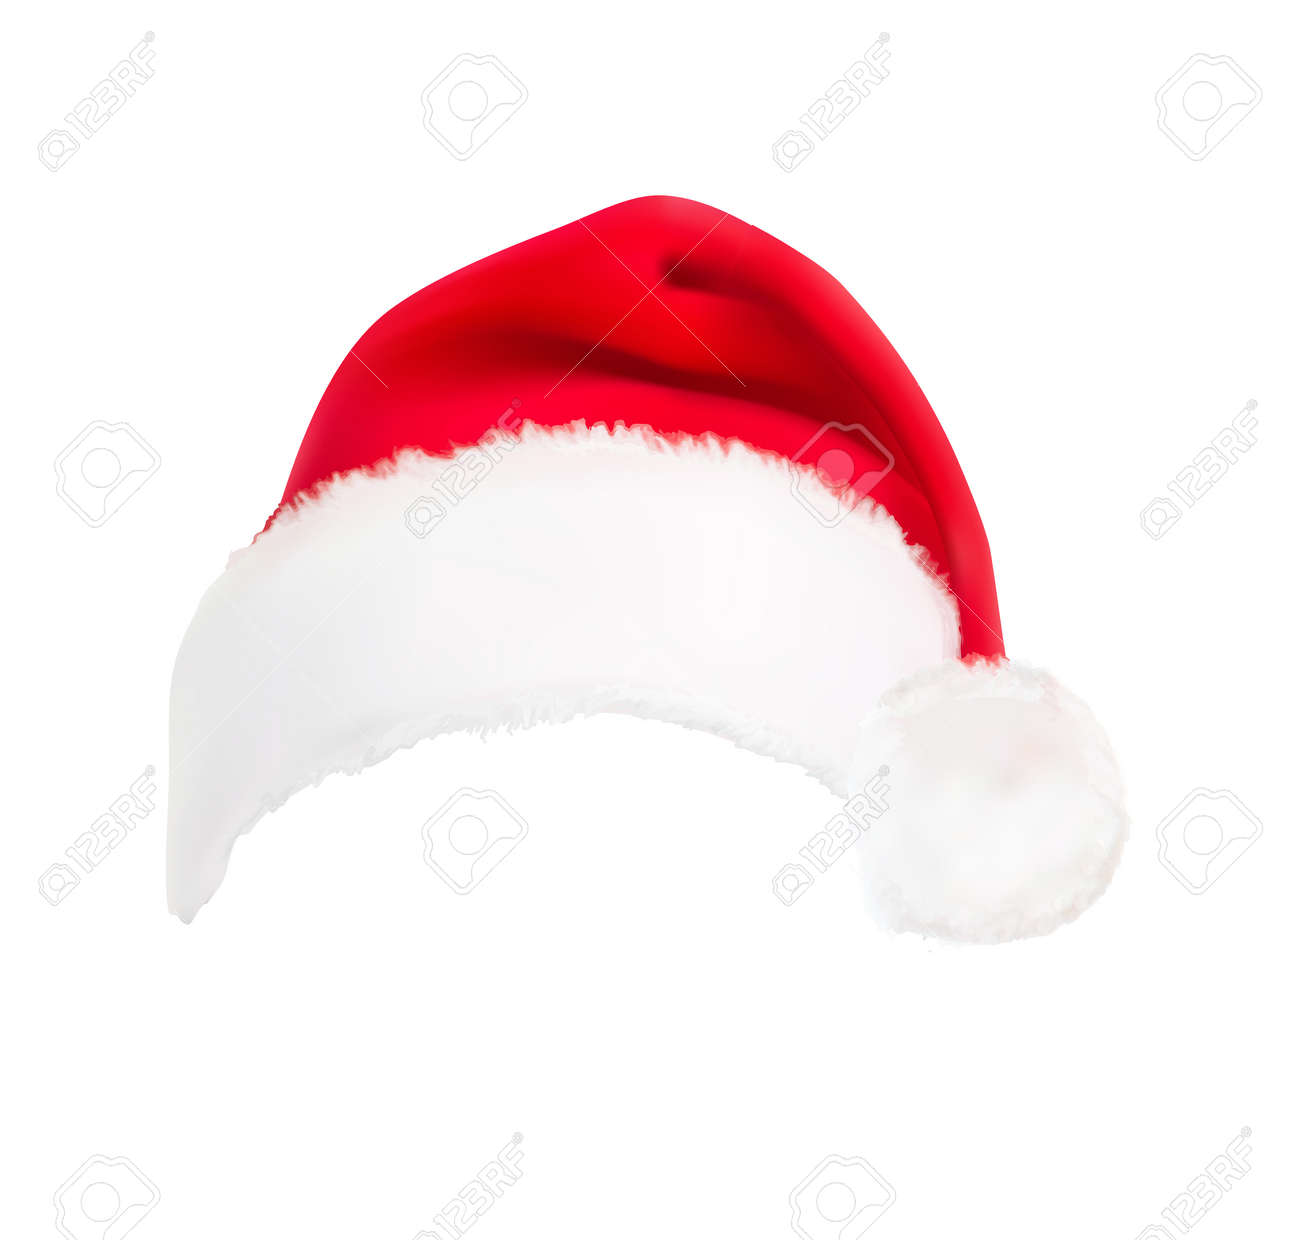 red santa hat vector royalty free cliparts vectors and stock rh 123rf com santa hat vector free santa hat vector png